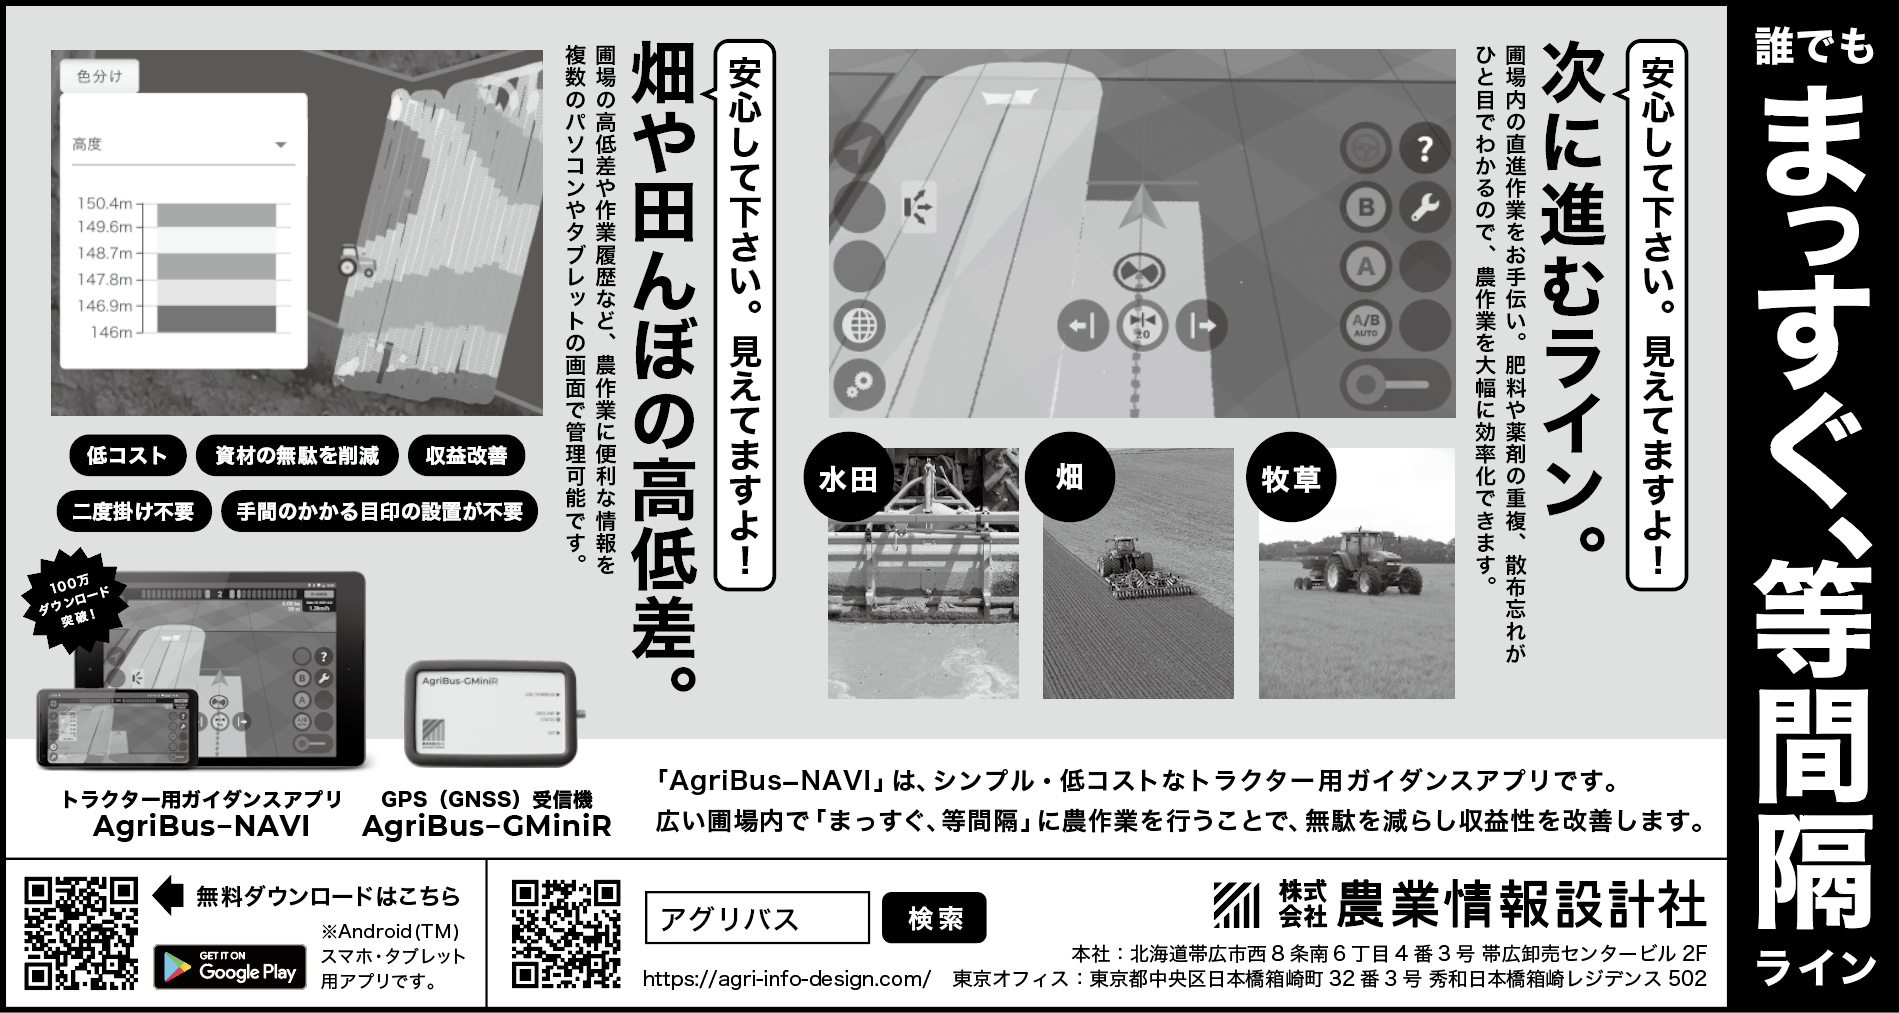 日本農業新聞に広告初出稿